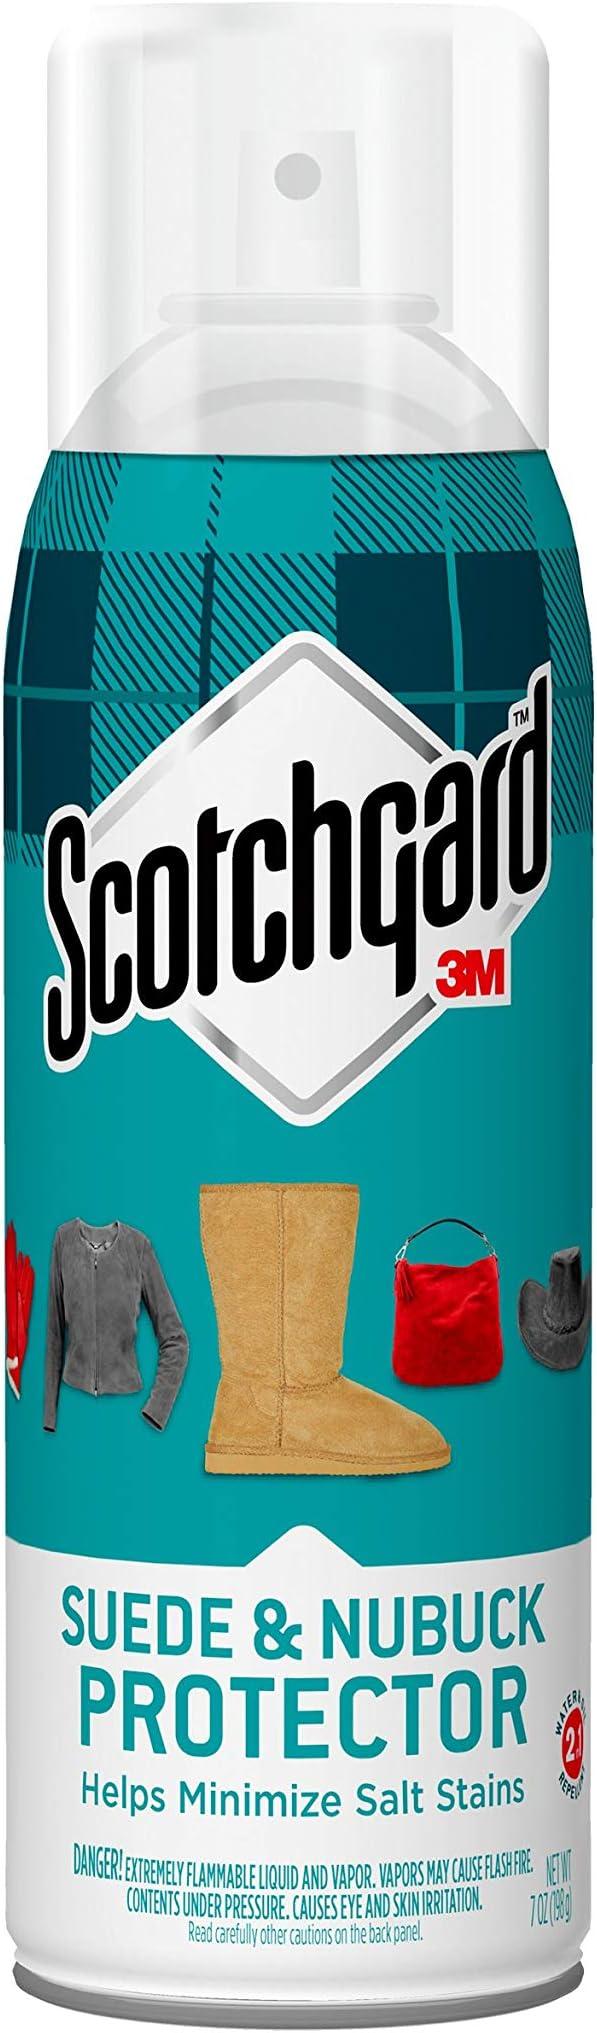 Scotchgard Suede & Nubuck Protector, 7 Ounces